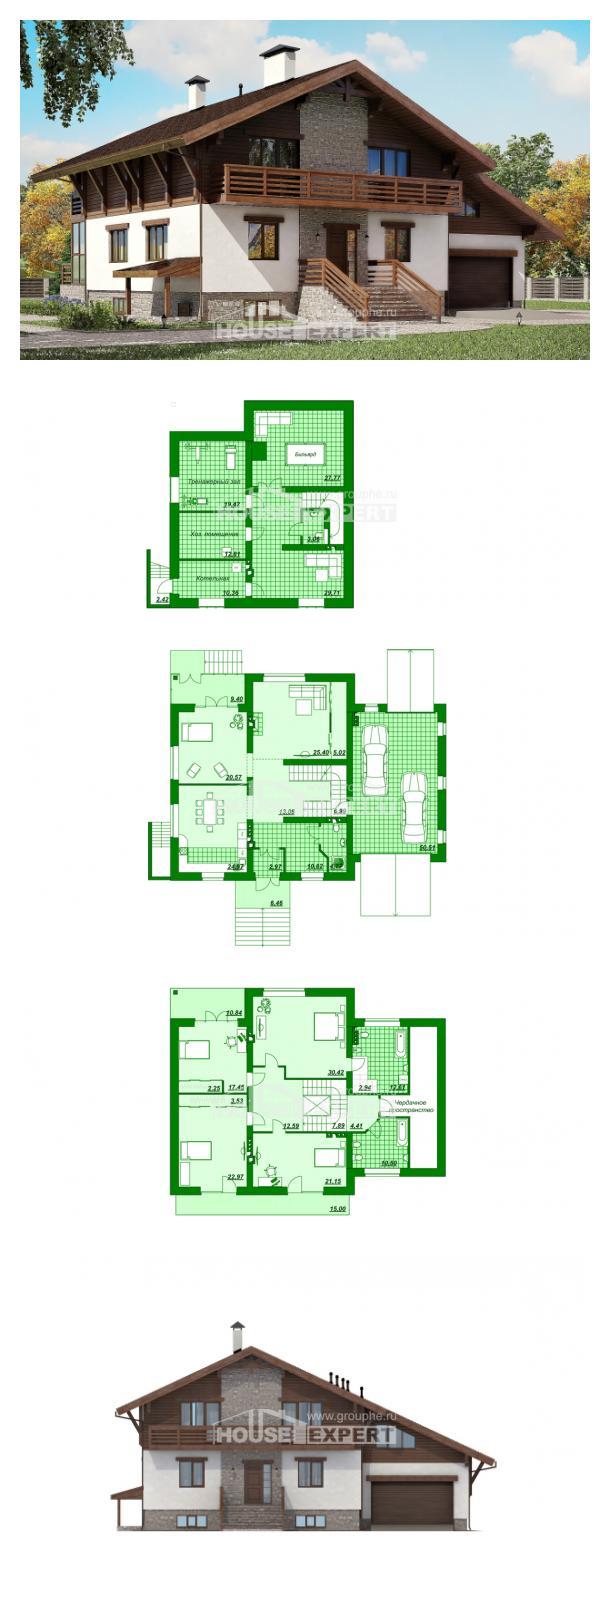 Projekt domu 420-001-R | House Expert